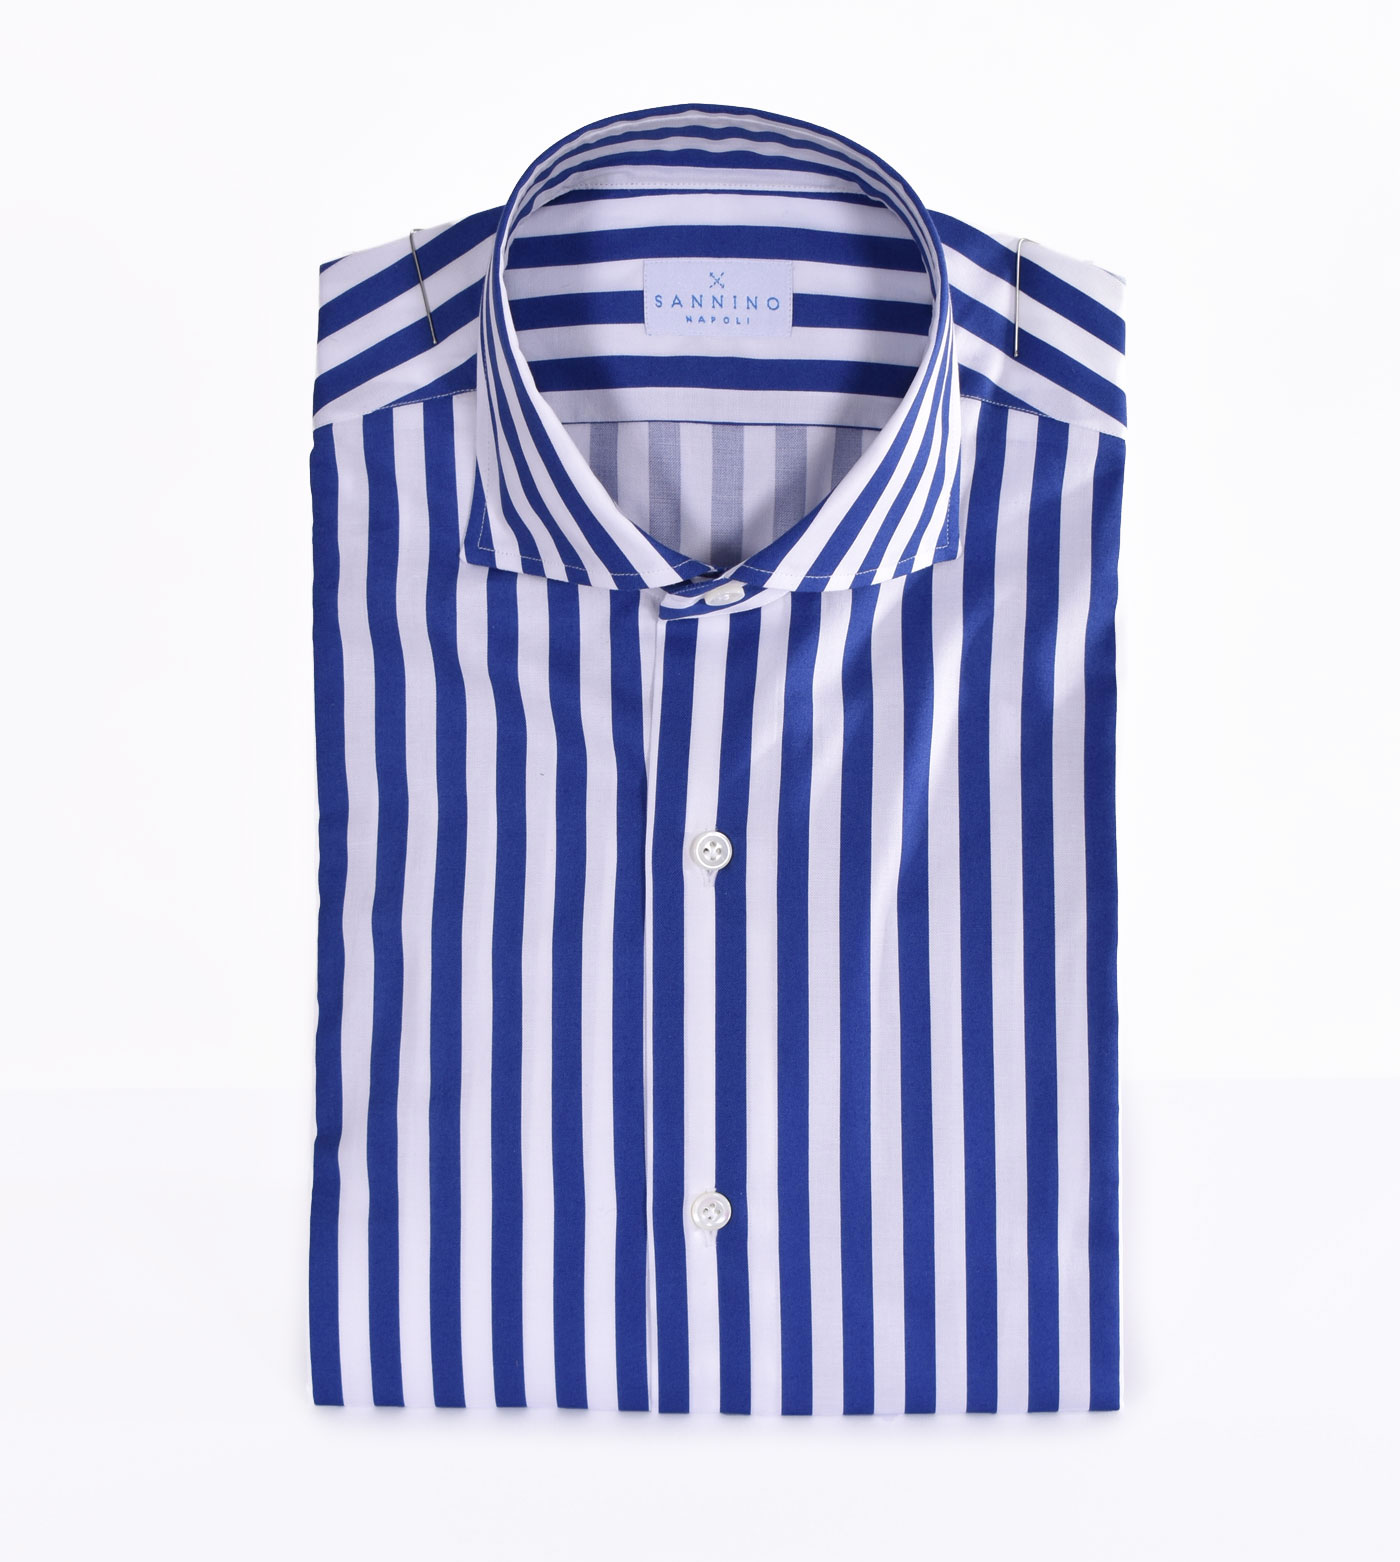 Royal blue striped Sannino shirt SANNINO | M21502